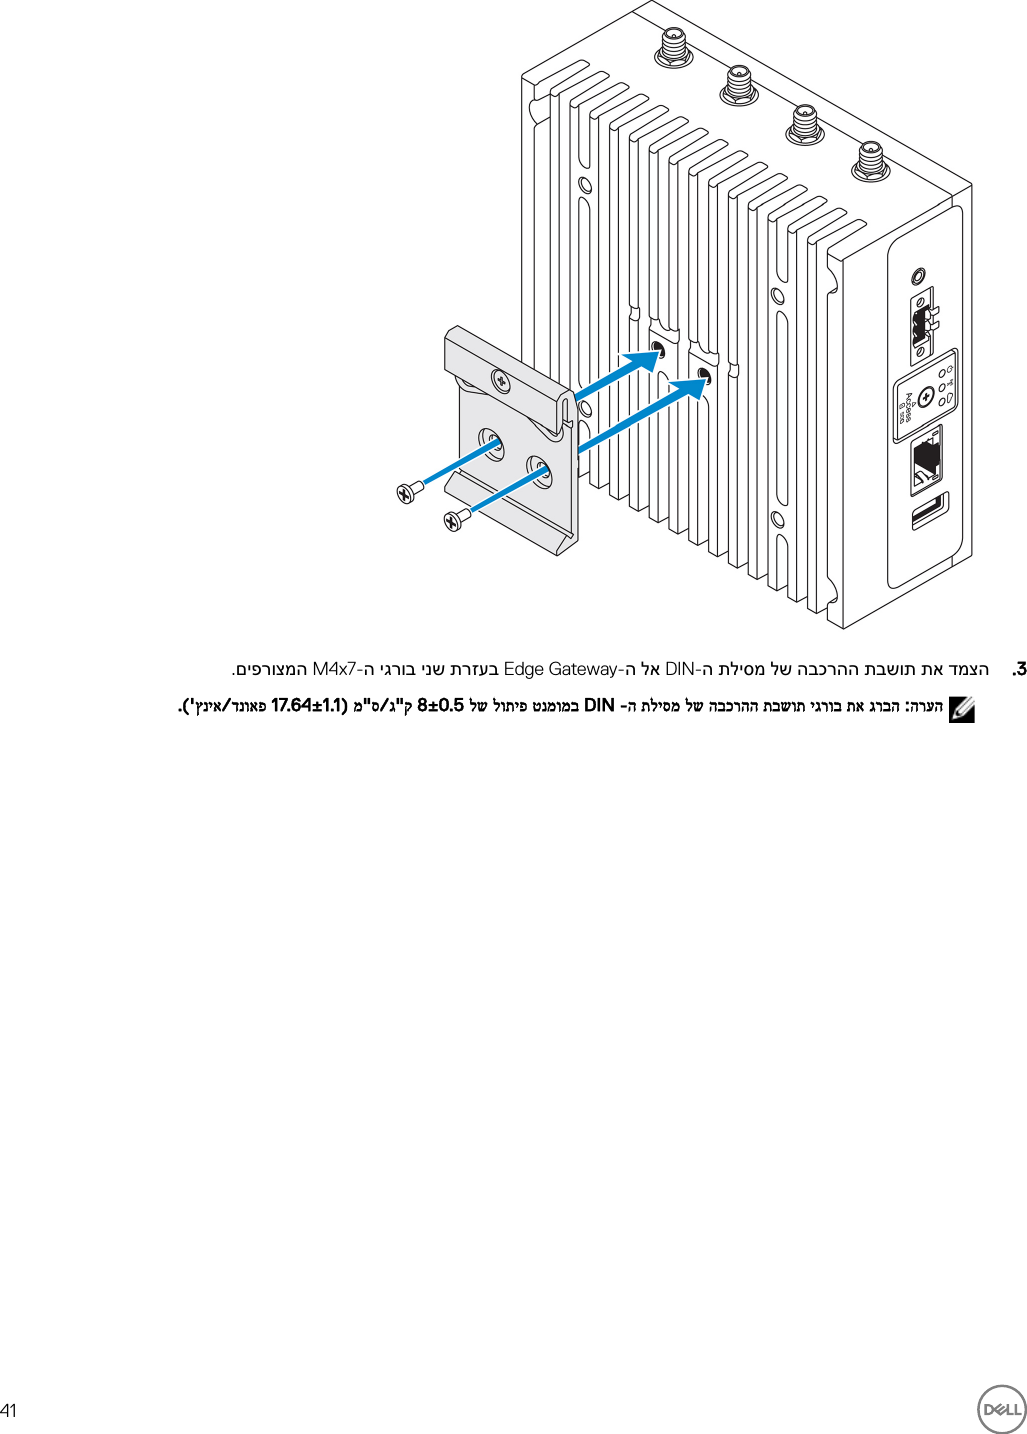 Dell edge gateway 3000 series 3001 מדריך התקנה והפעלה User